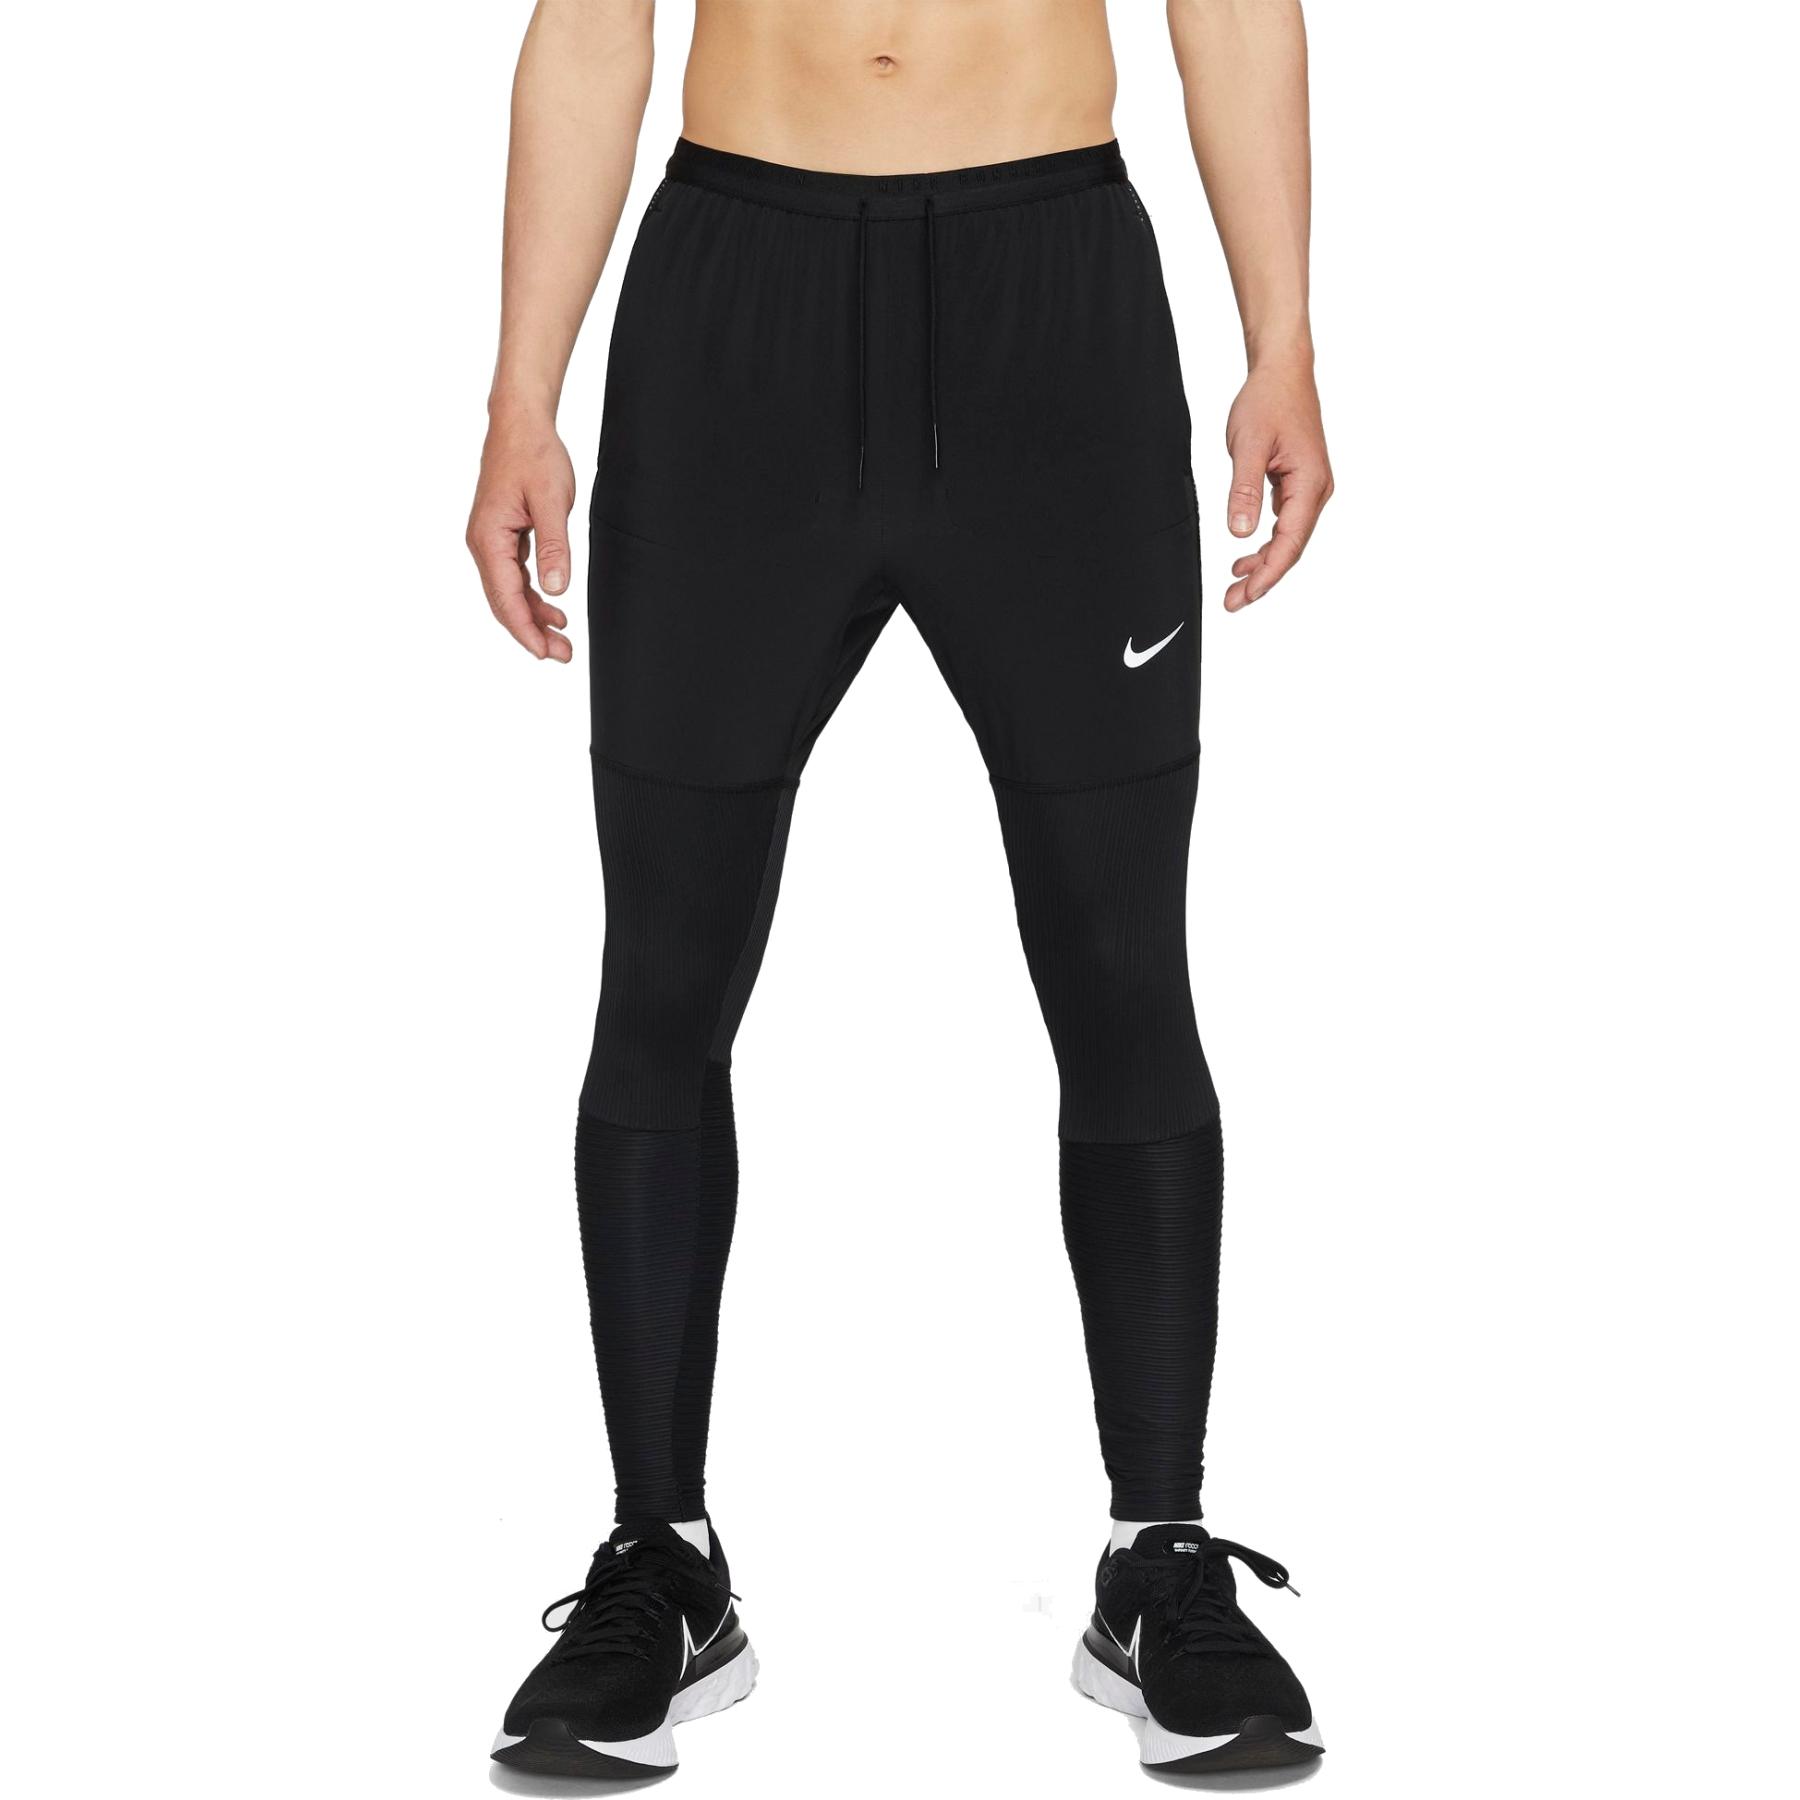 Nike Dri-Fit Phenom Run Division Hybrid Pantalon para Hombre - black/black/reflective silver DD4878-010